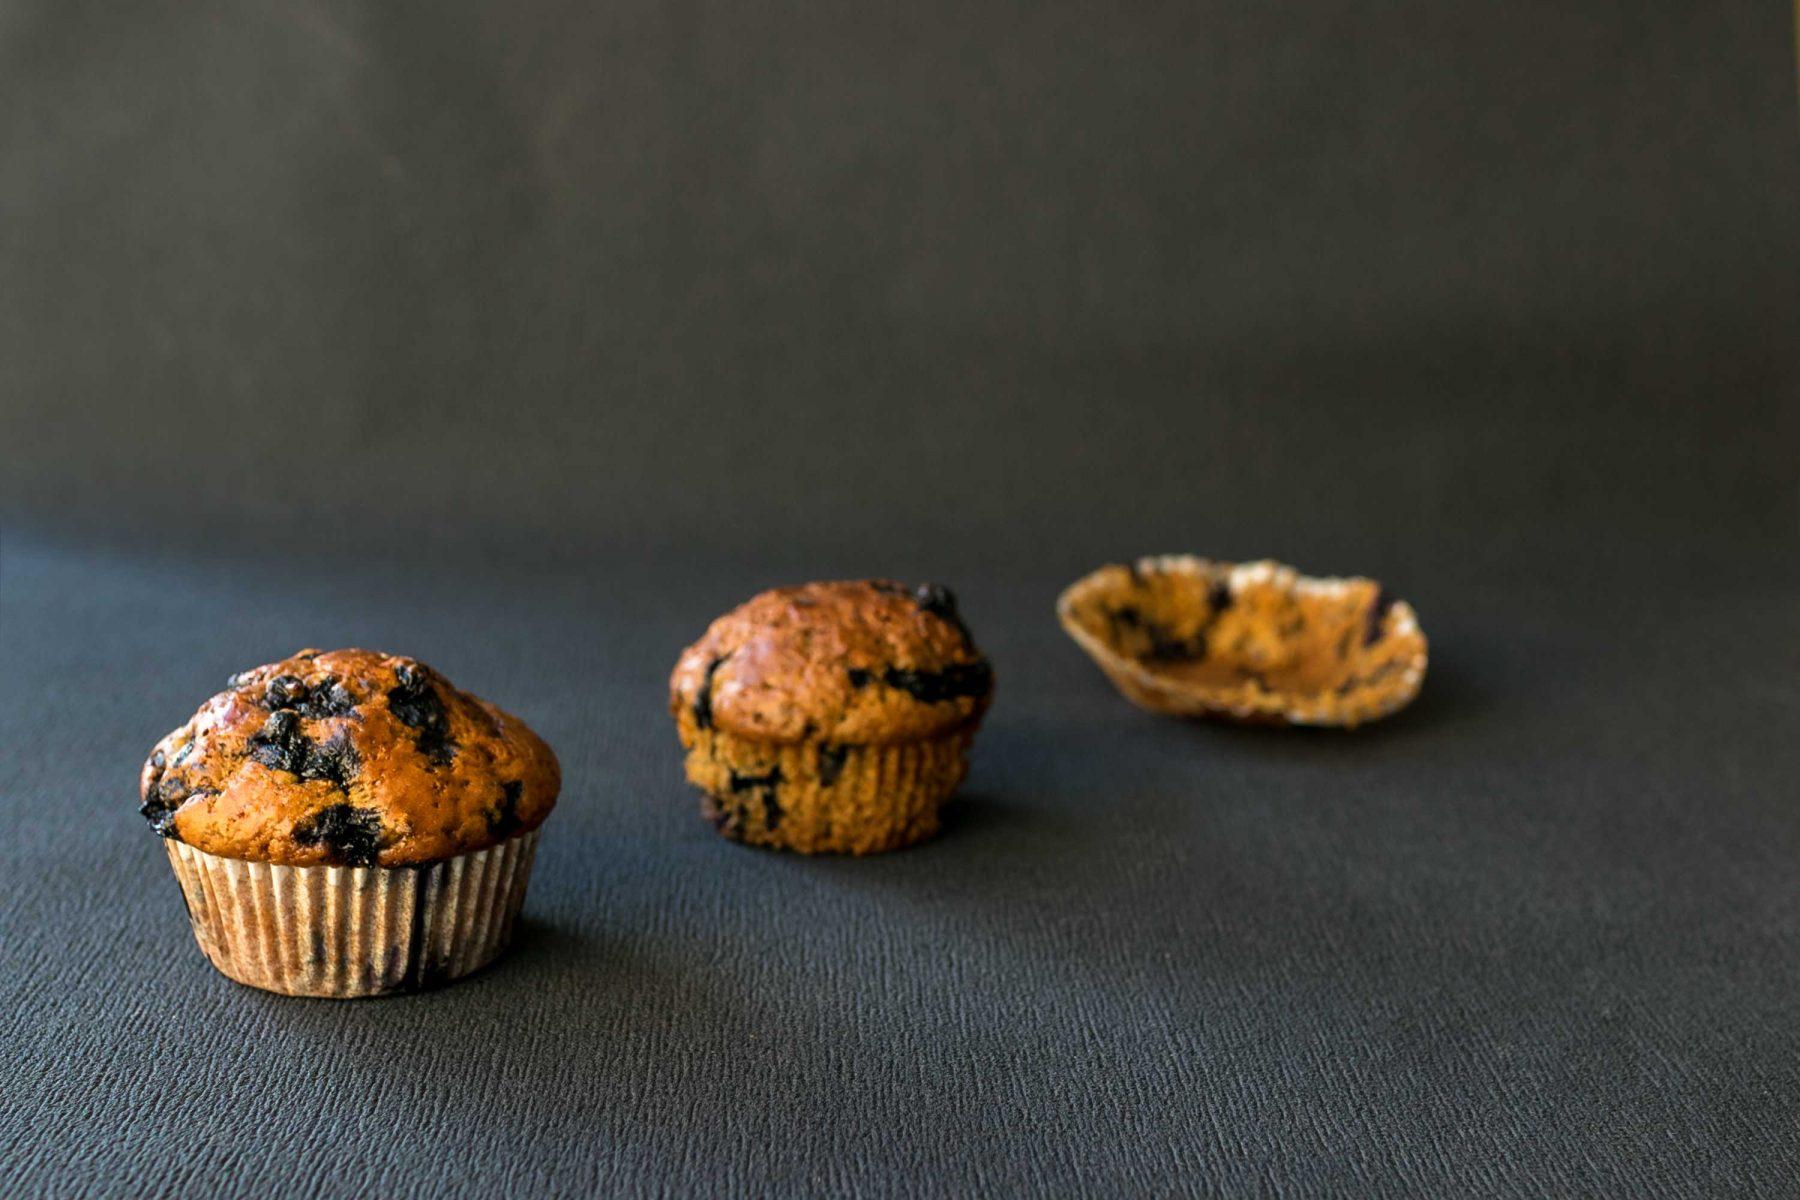 Muffin s mrkvou a cucoriedkou v obale, muffin s mrkvou a cucoriedkou bez obalu a samostny obal.